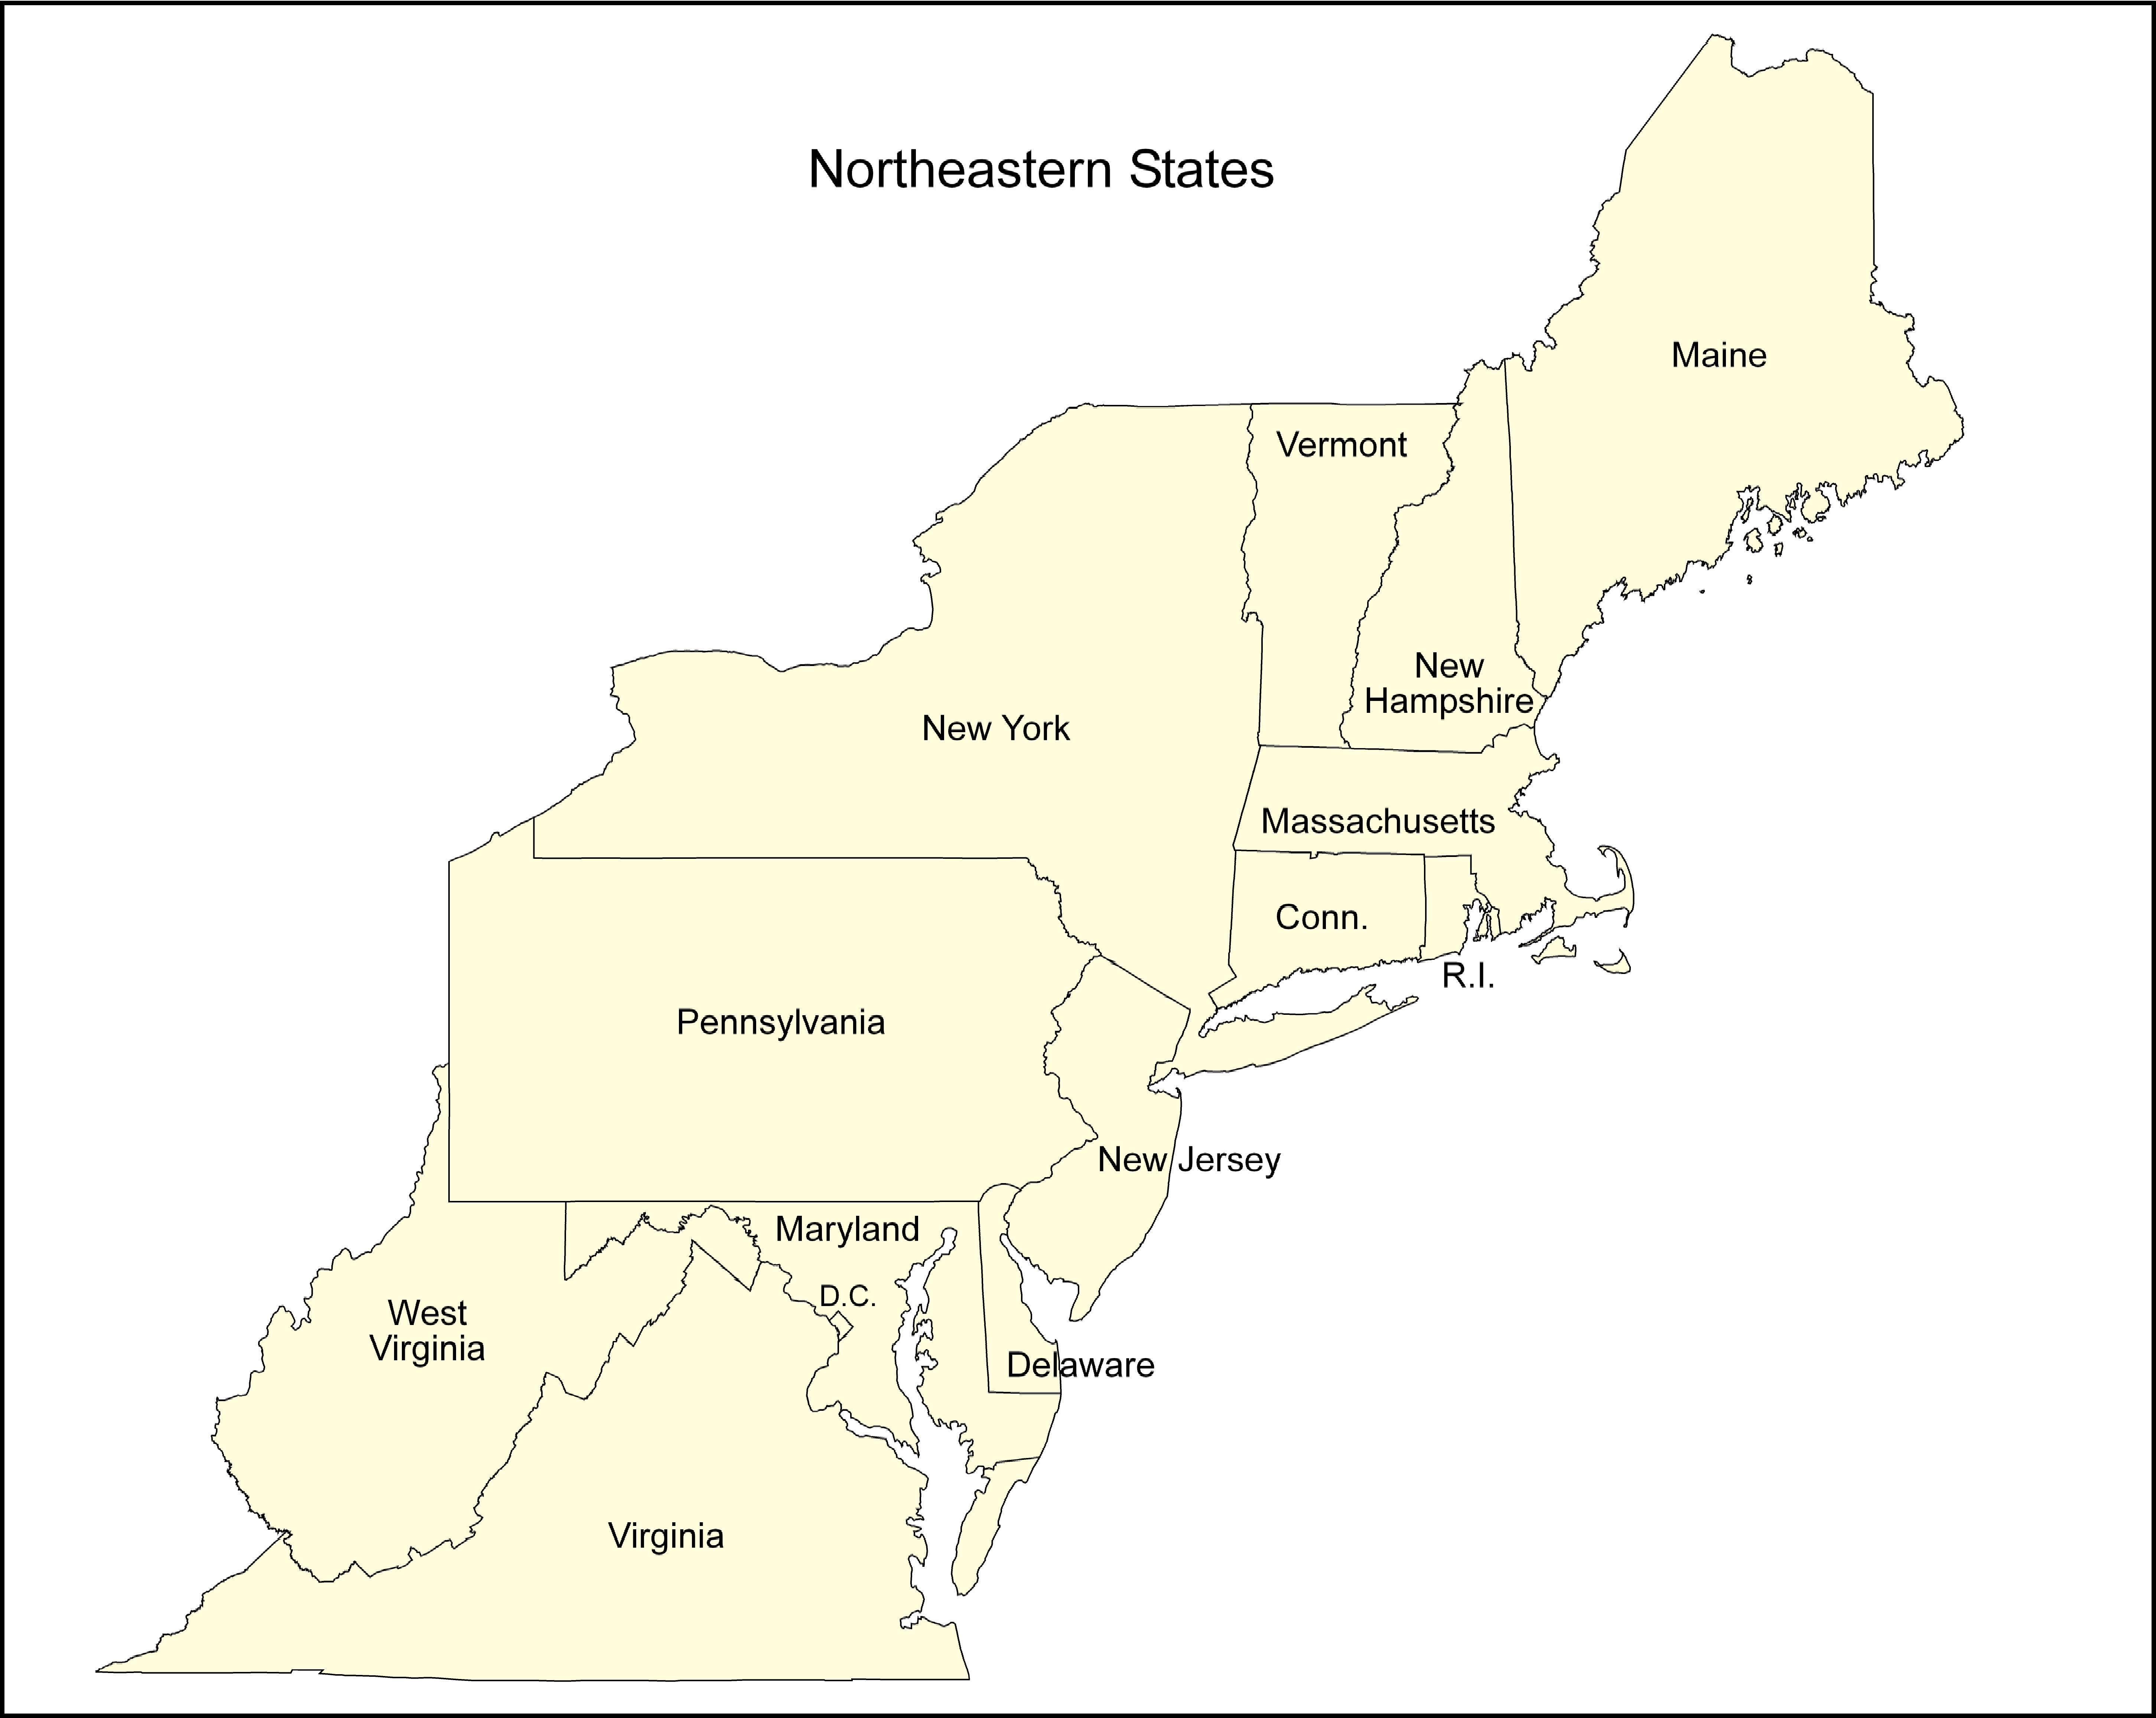 Northeast States Map U.S. Regional